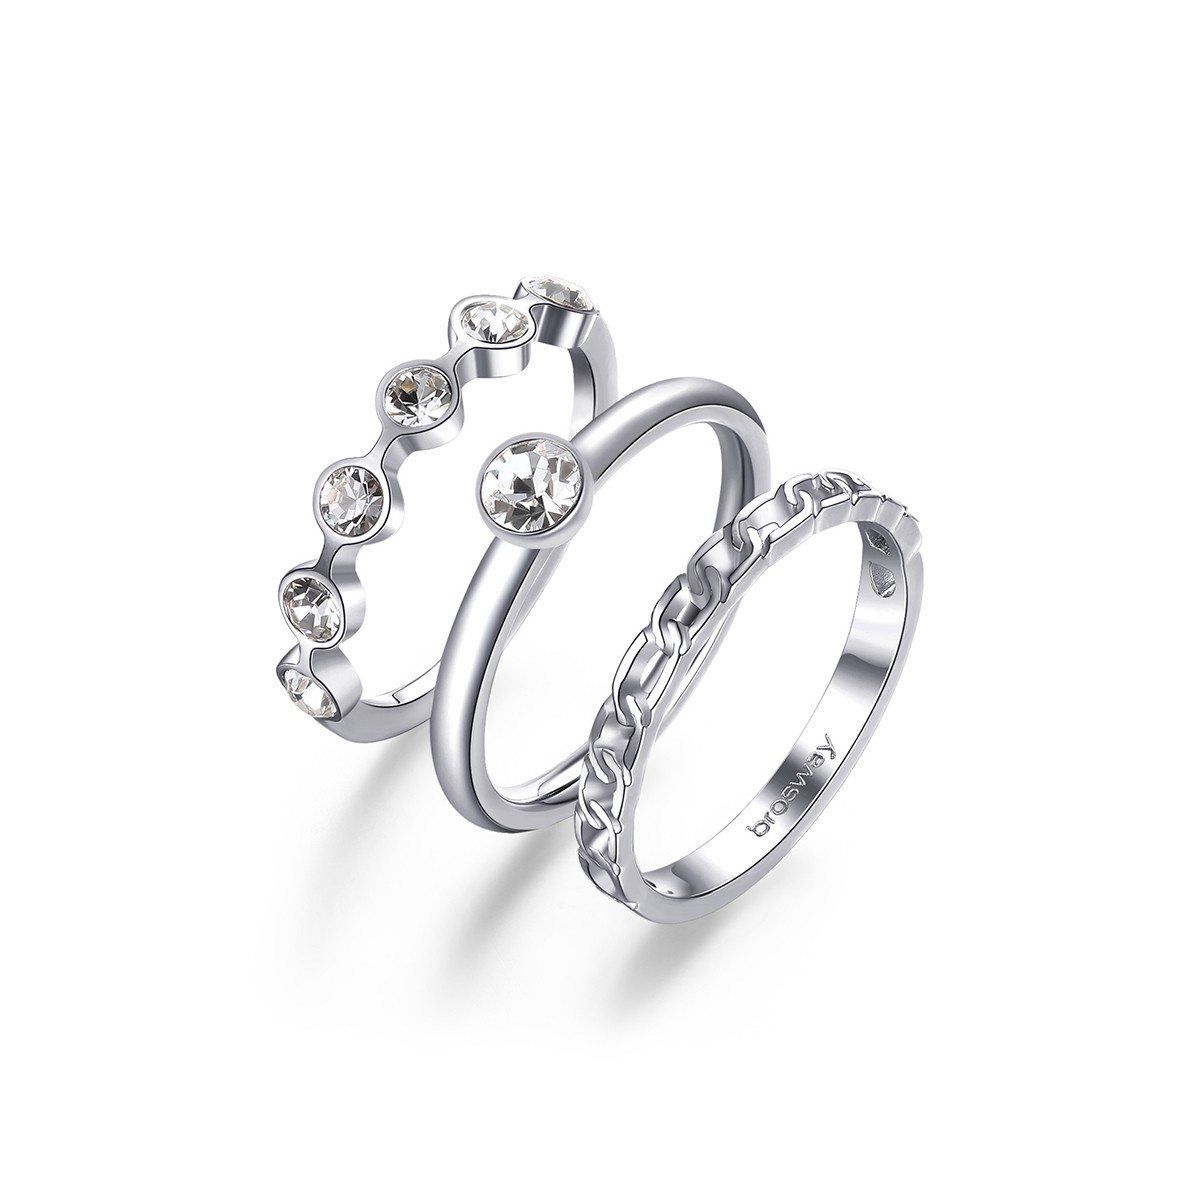 symphonia new set of rings